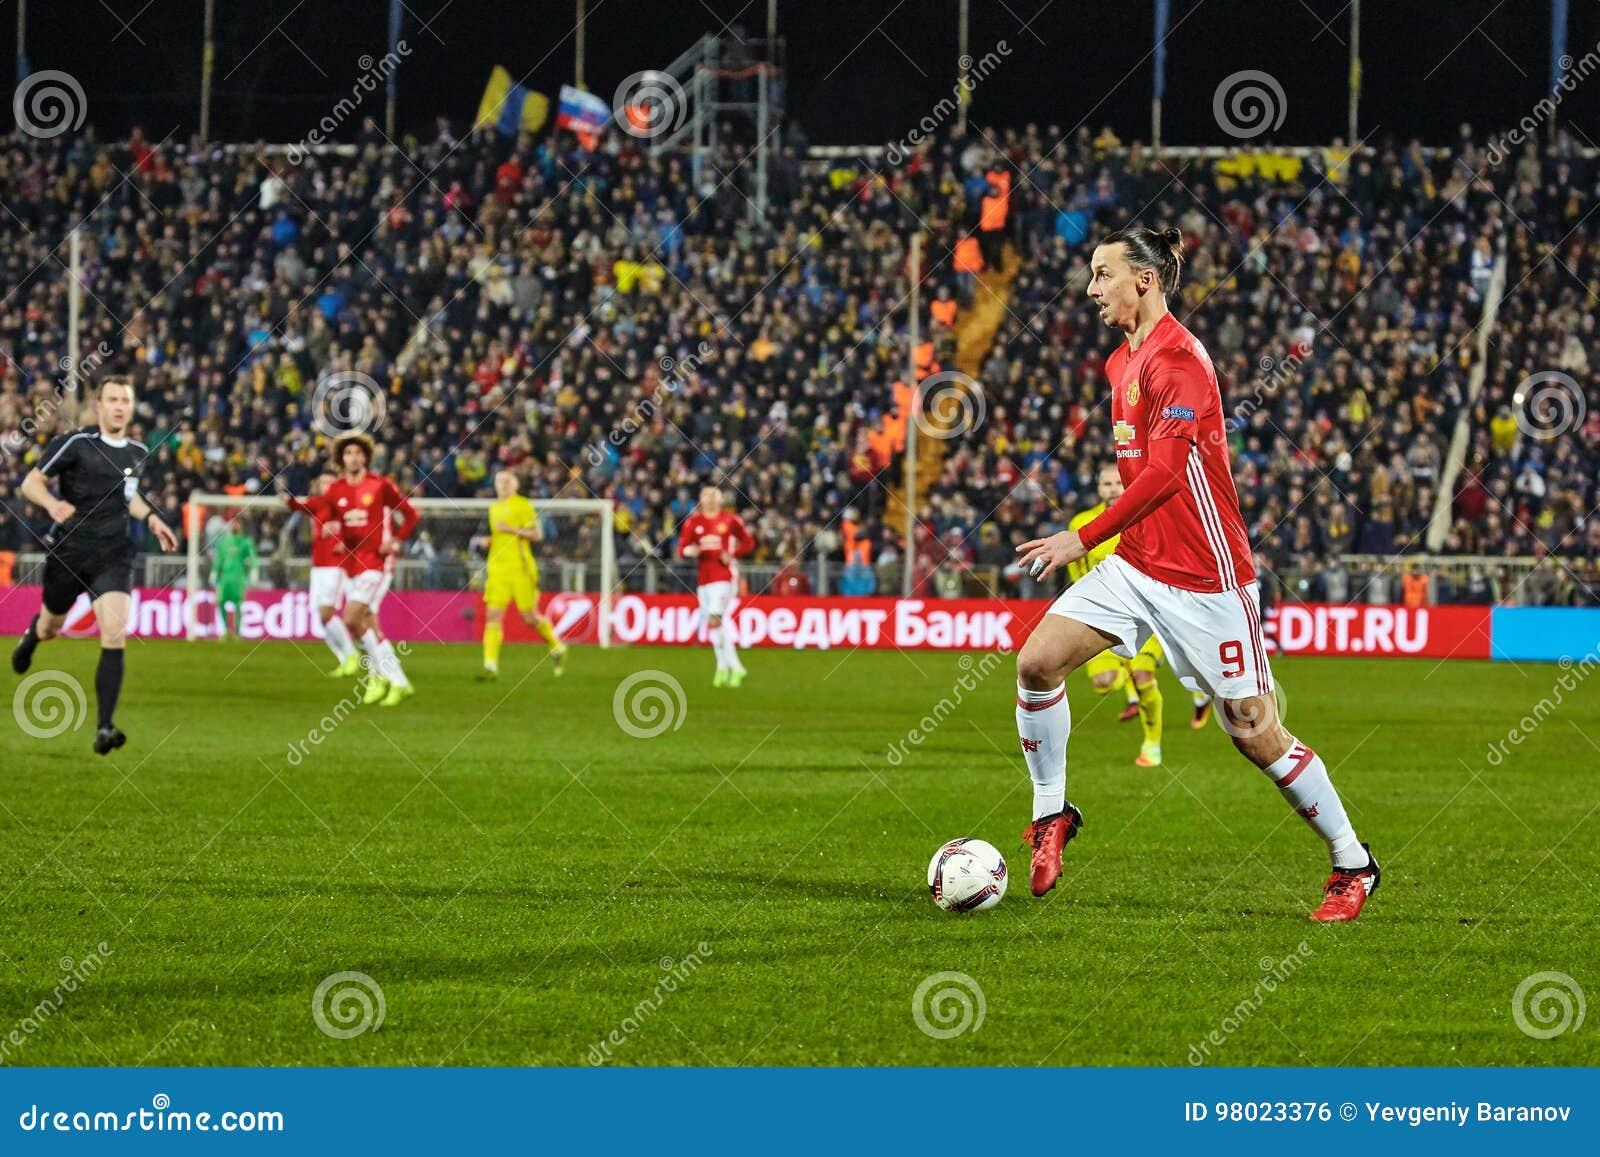 82c3151a3 Zlatan Ibrahimovic Feyenoord Game Moments Editorial Photo - Image of ...